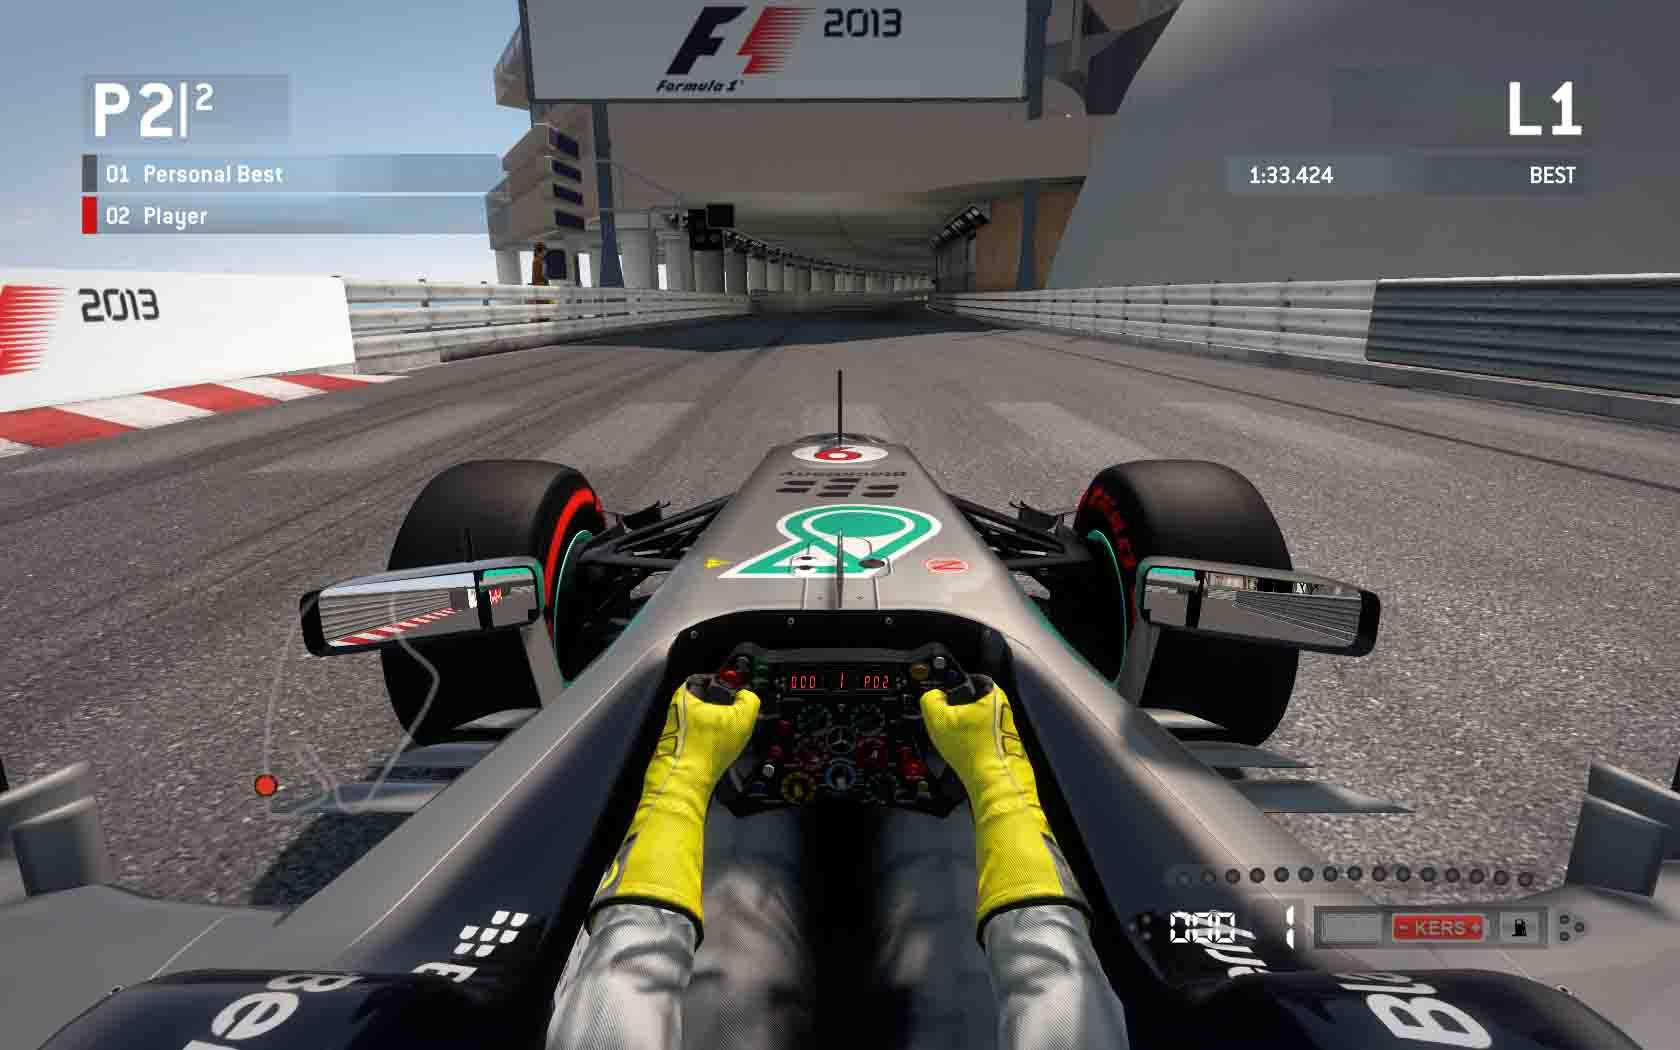 F1_2013 2013-11-05 00-08-22-42 copy.jpg